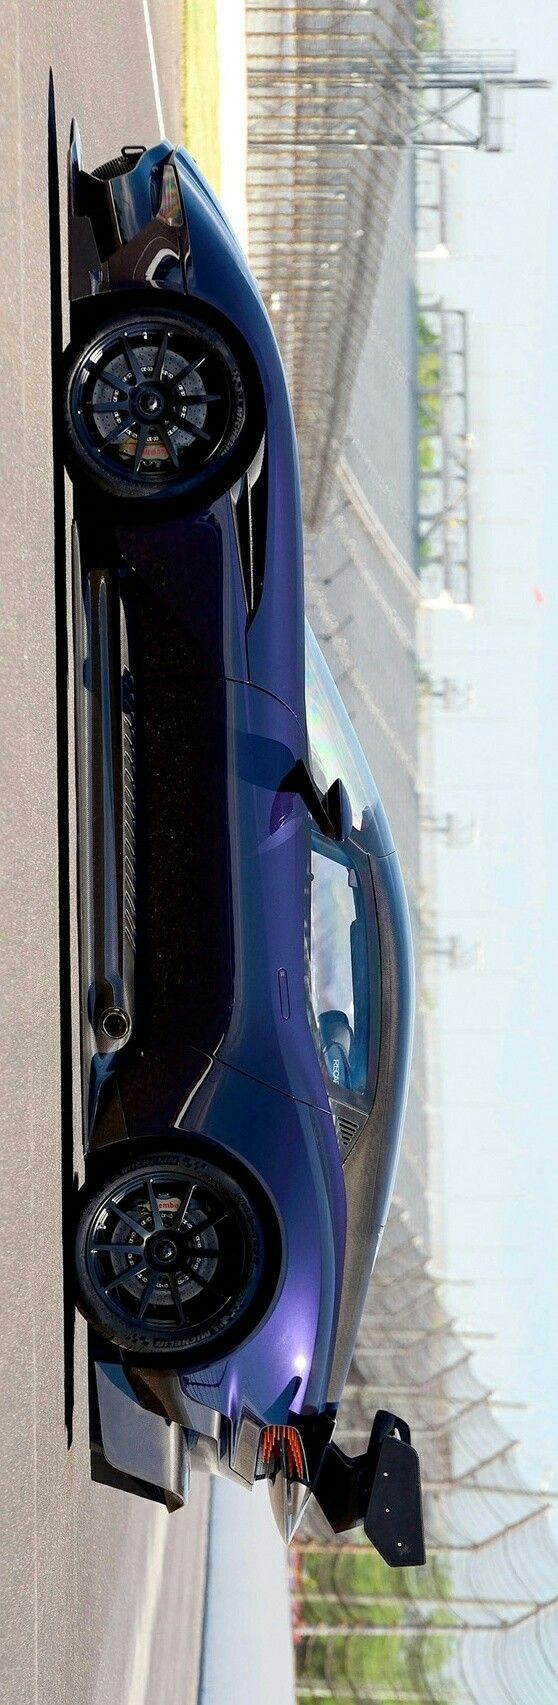 (°!°) 2016 Aston Martin Vulcan